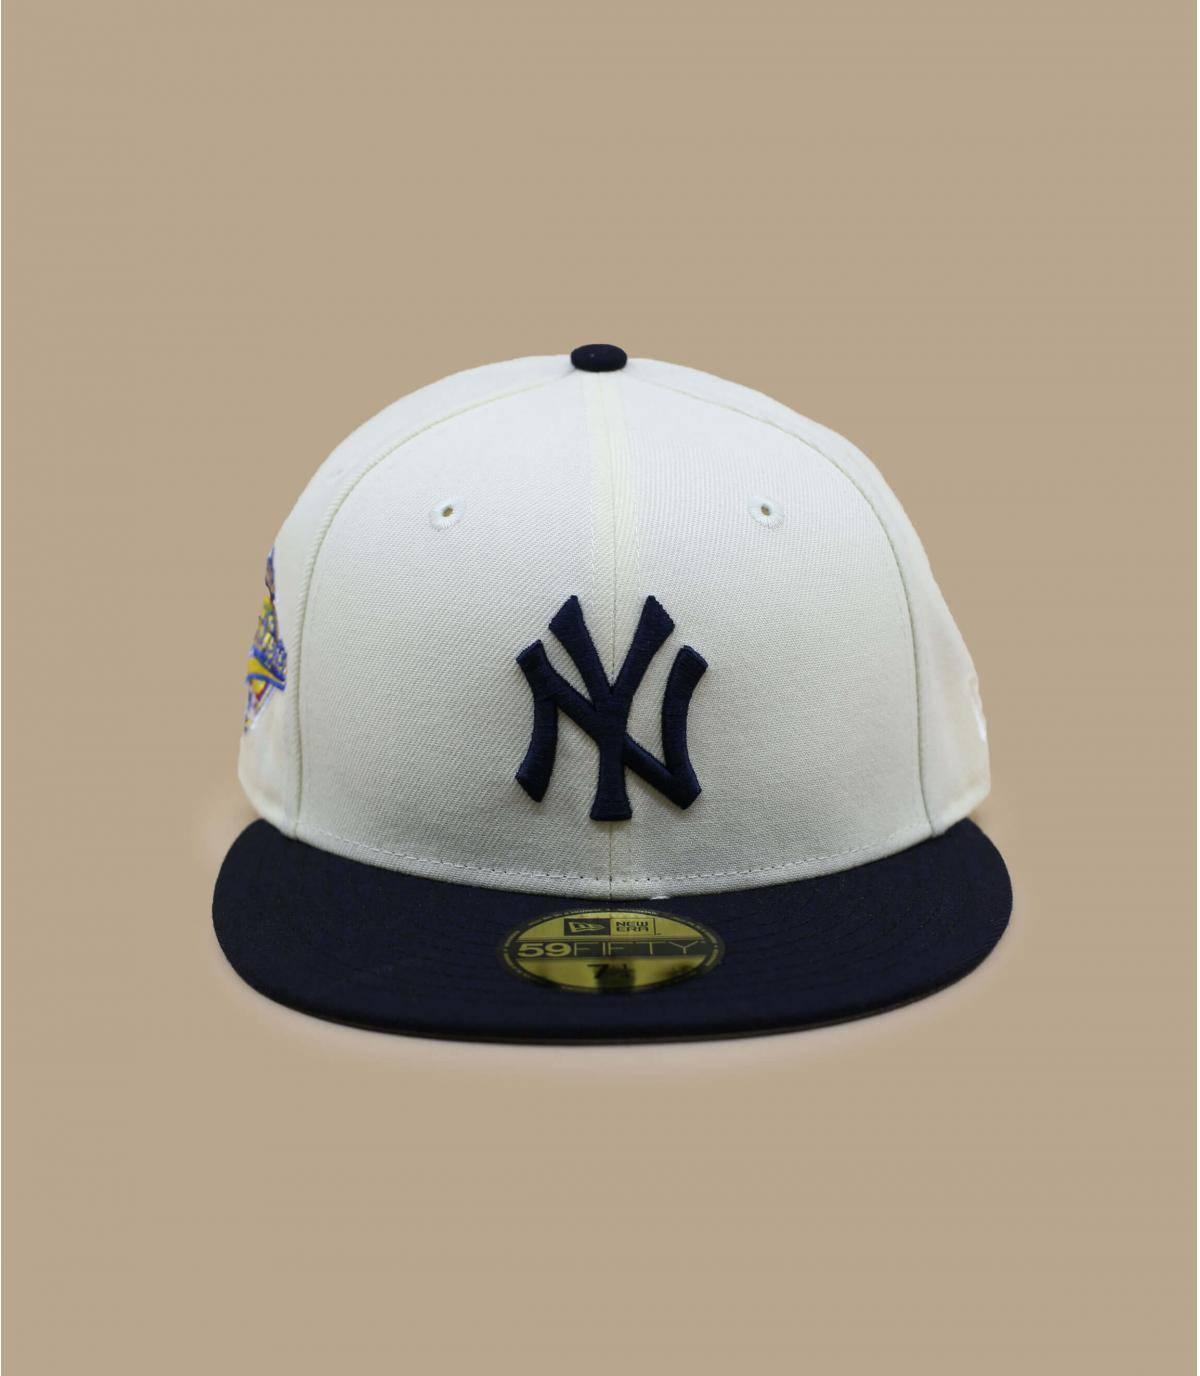 Dettagli 5950 NY 1996 World Series - image 2